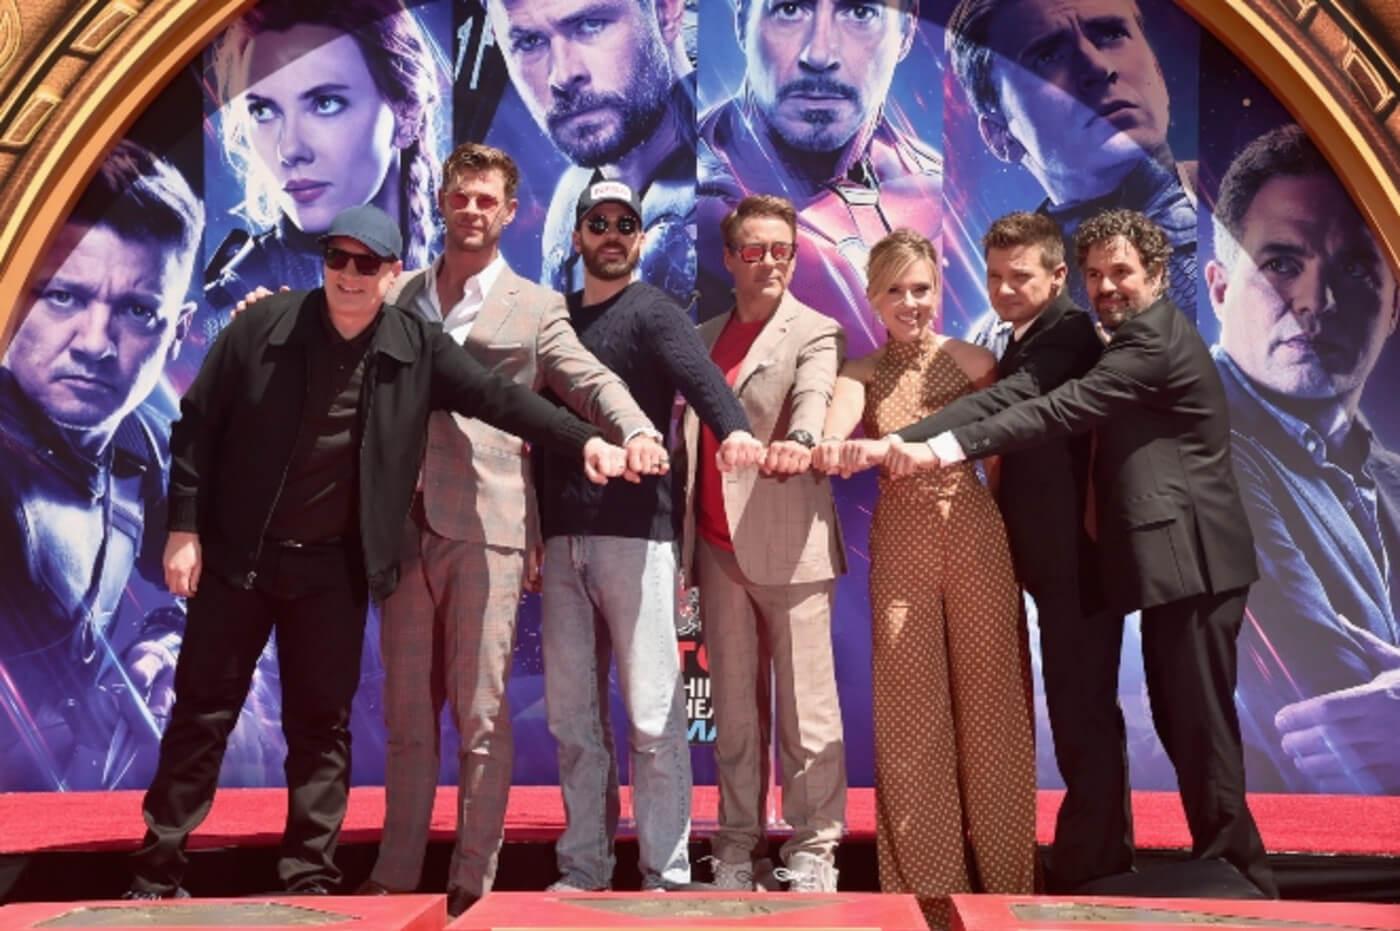 Avengers 5 Top 7 Ways Robert Downey Jr Can Return as Iron Man In The Next Avengers Movie